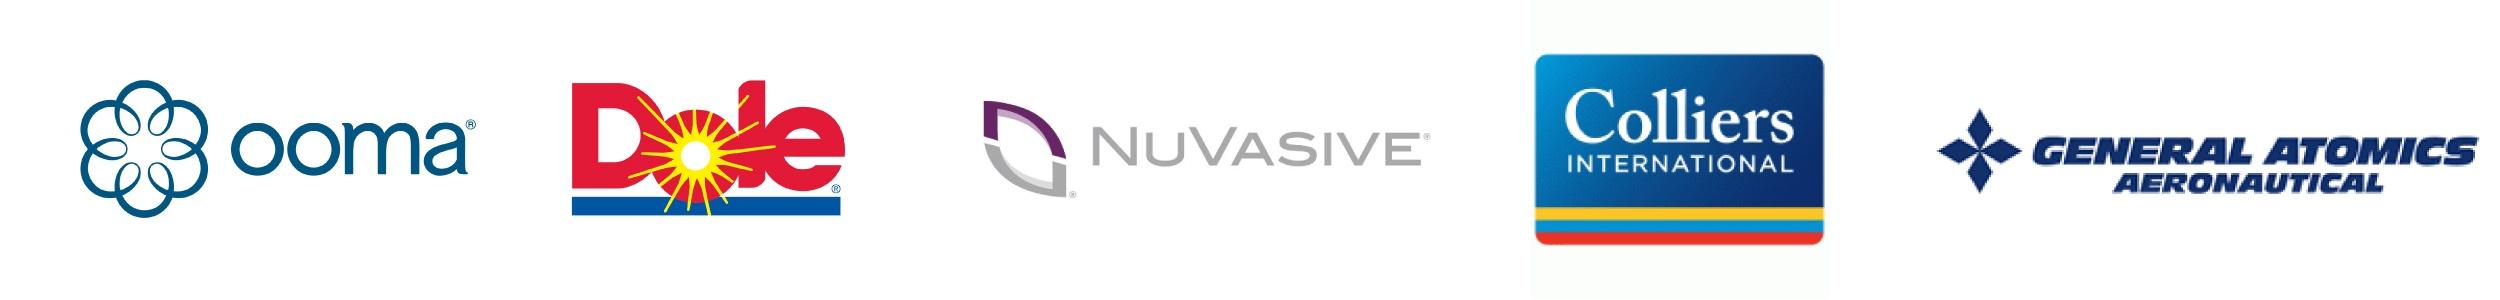 AdaptivEdge Client Logos